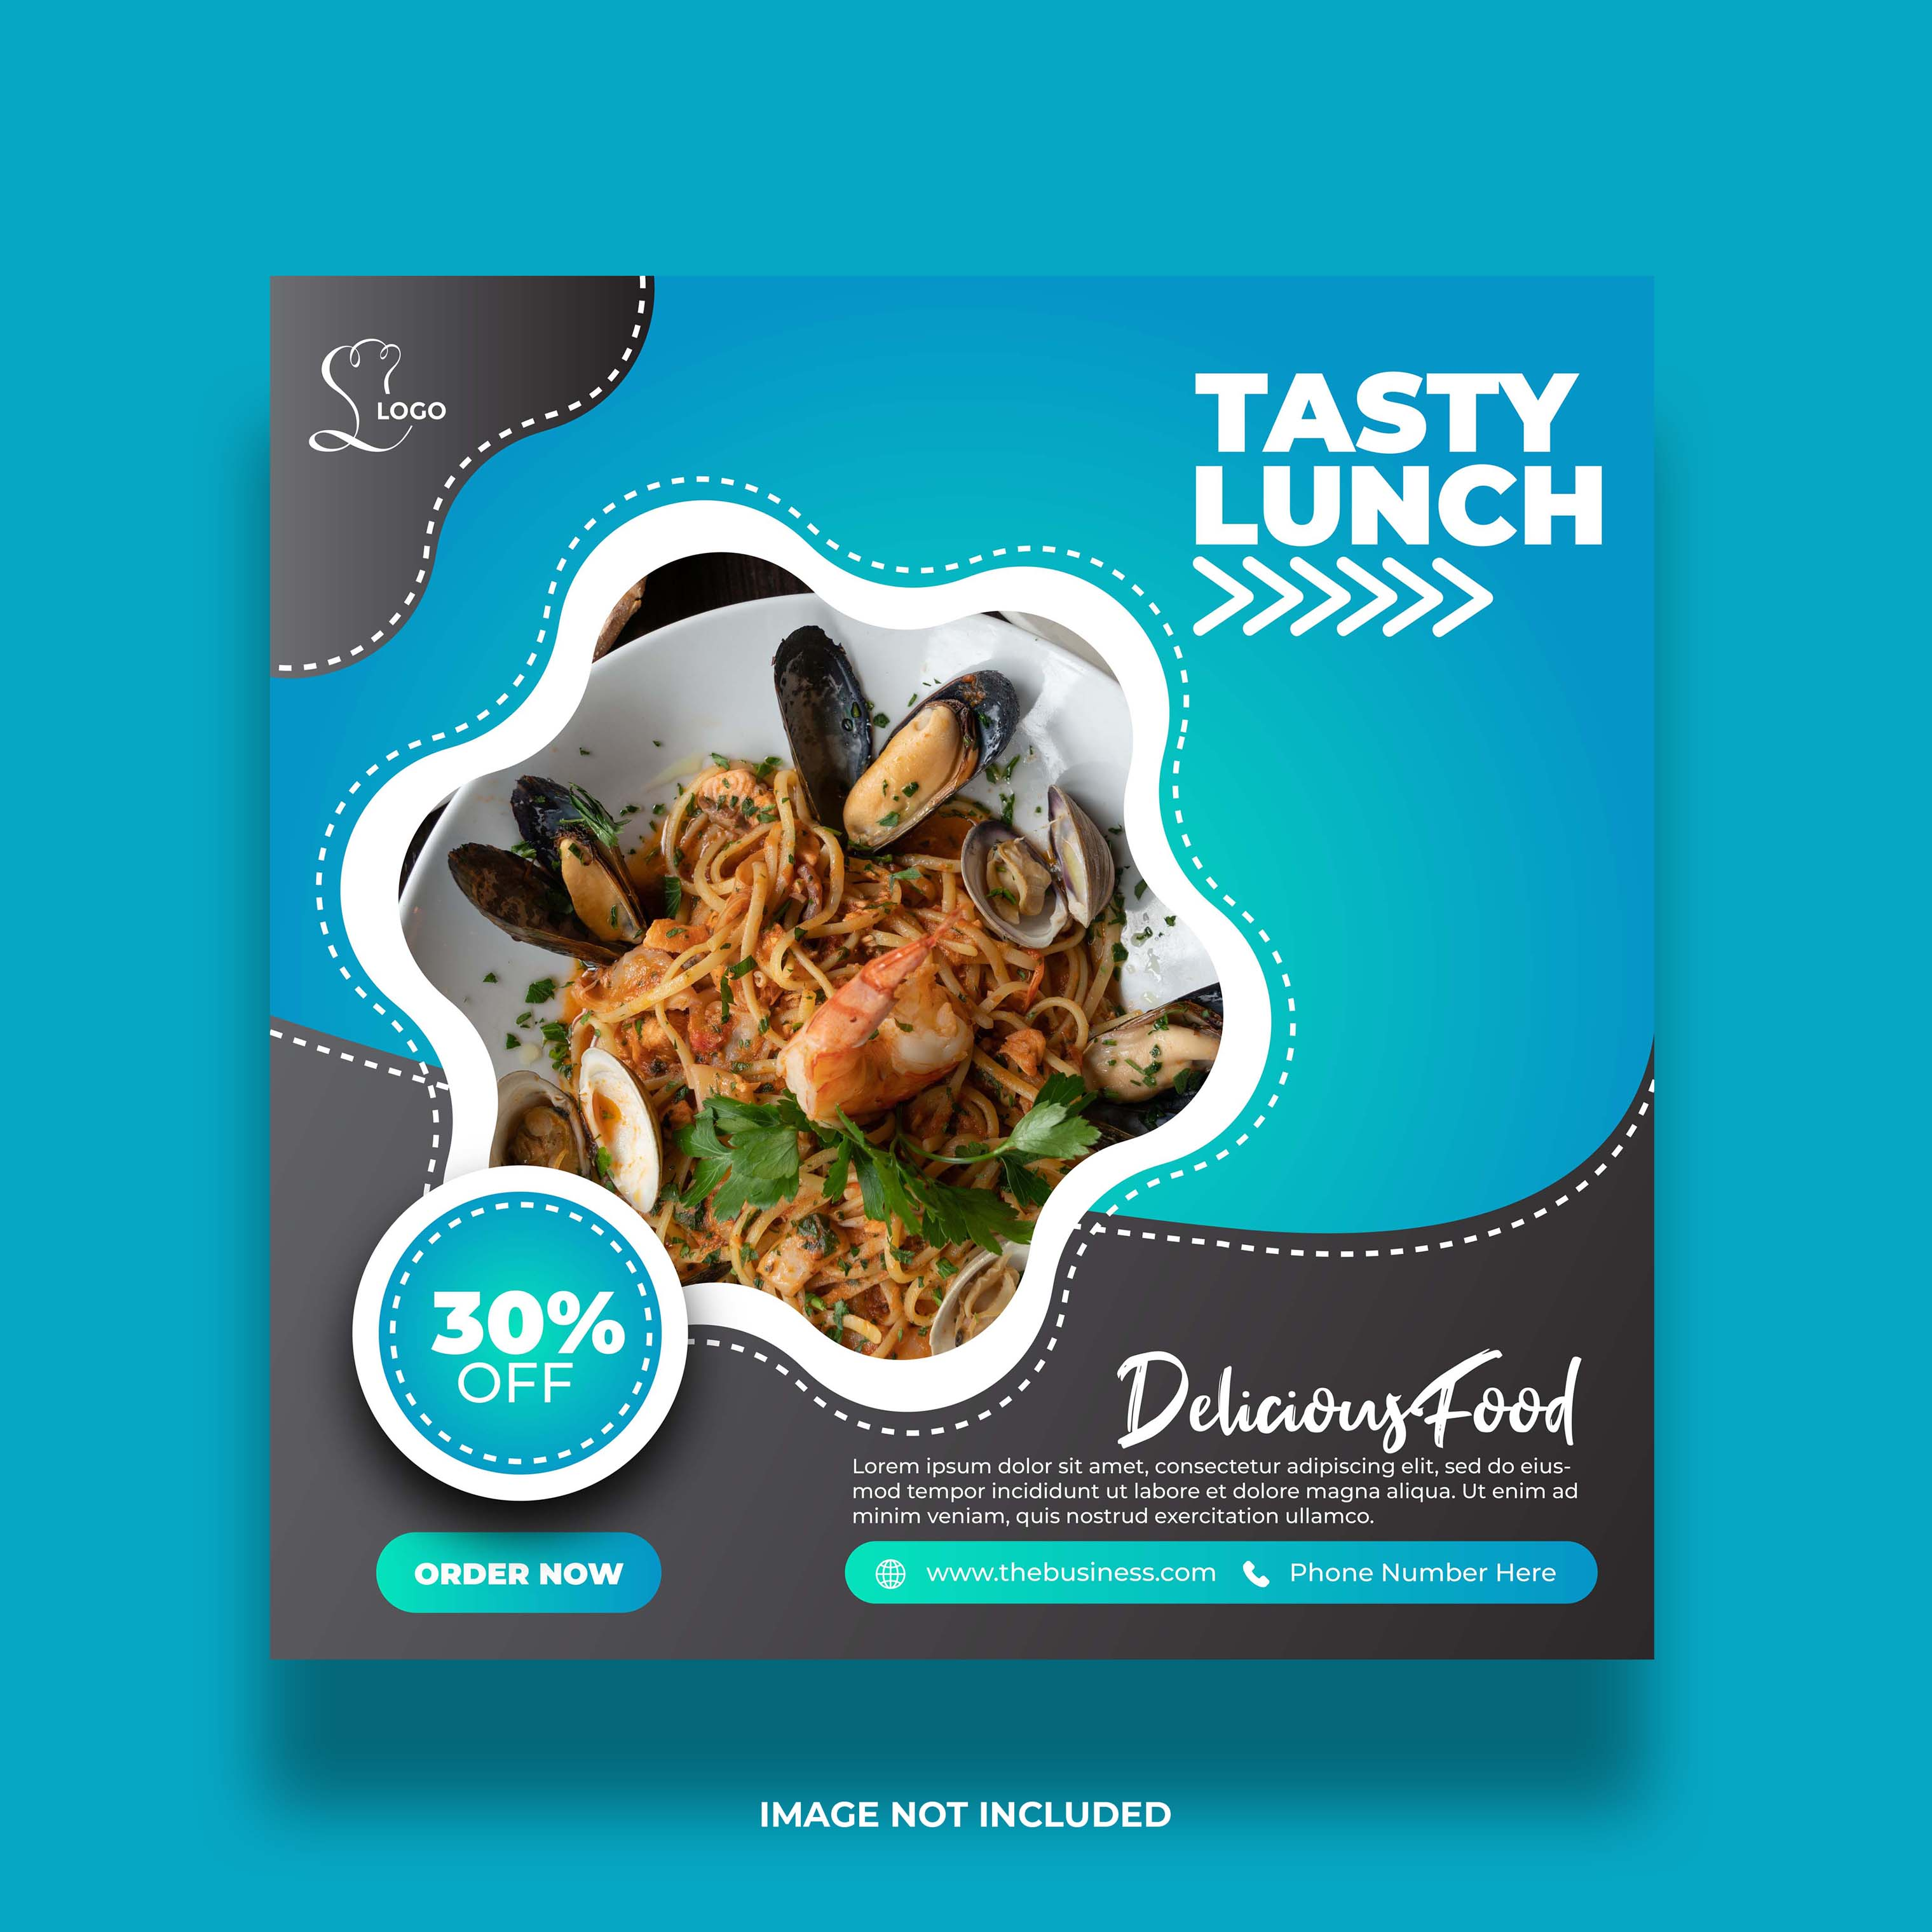 comida de restaurante almuerzo sabroso banner de redes sociales para publicación